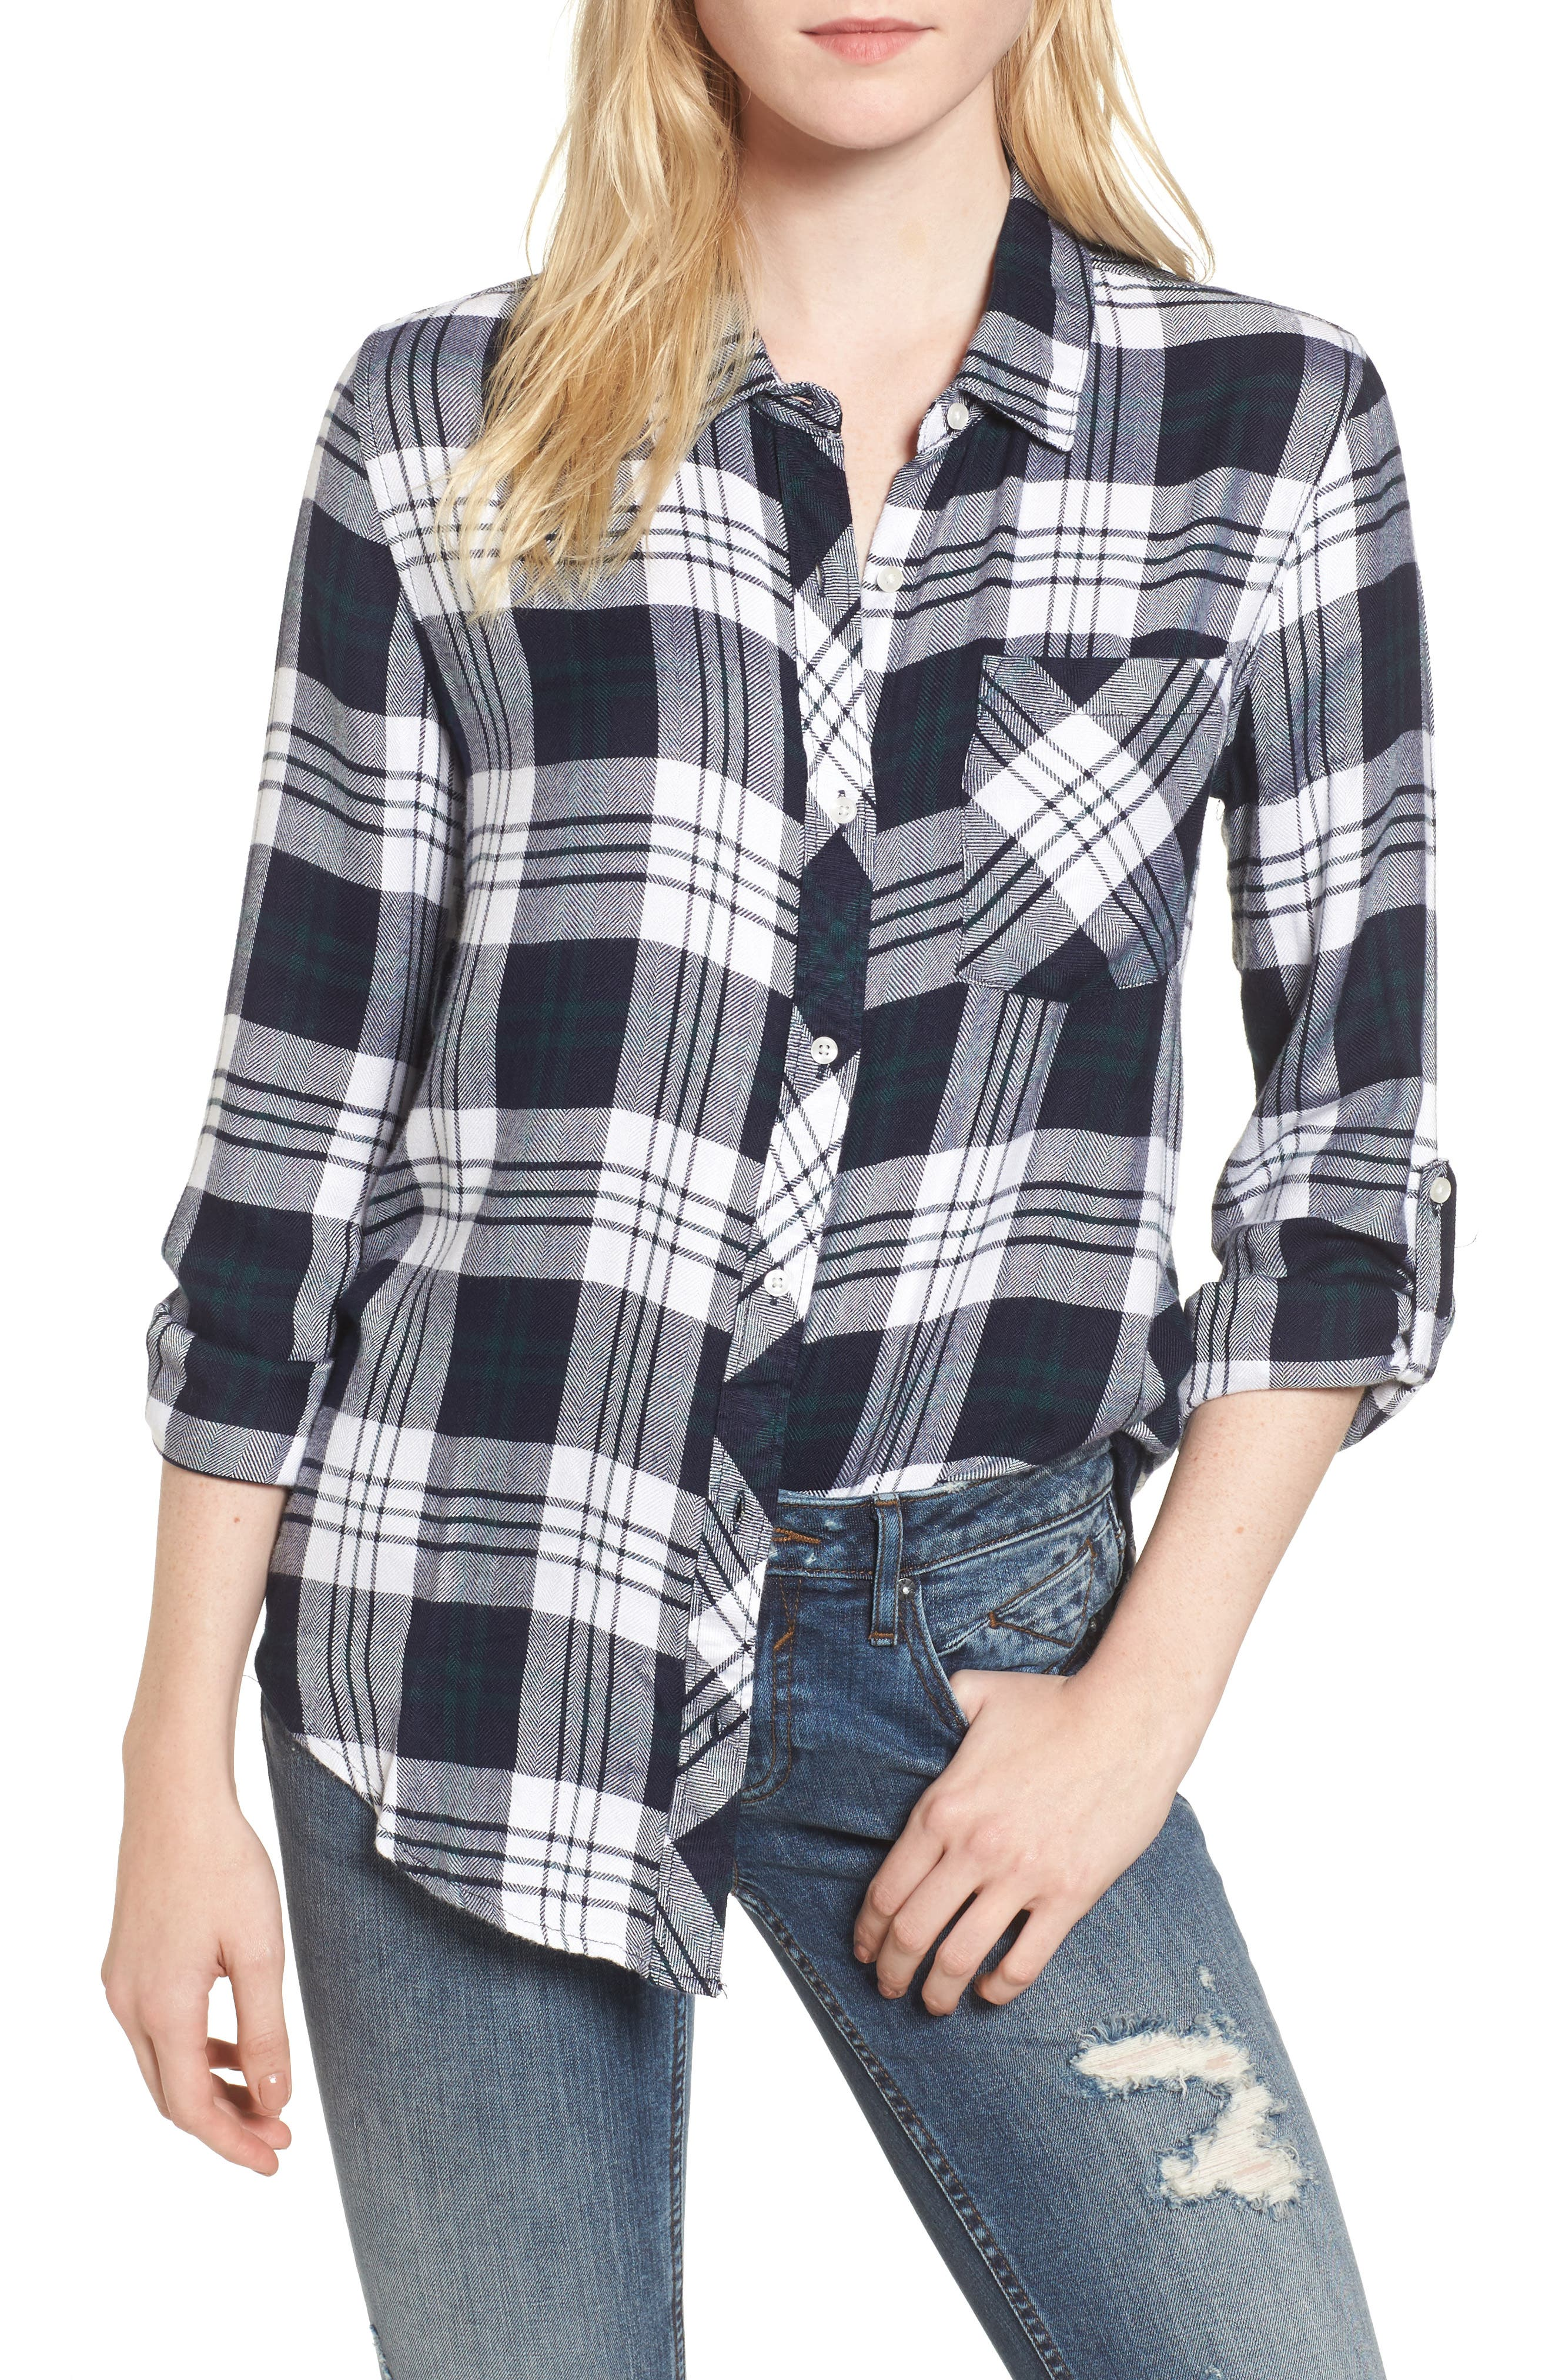 Alternate Image 1 Selected - Thread & Supply Kiana Plaid Shirt